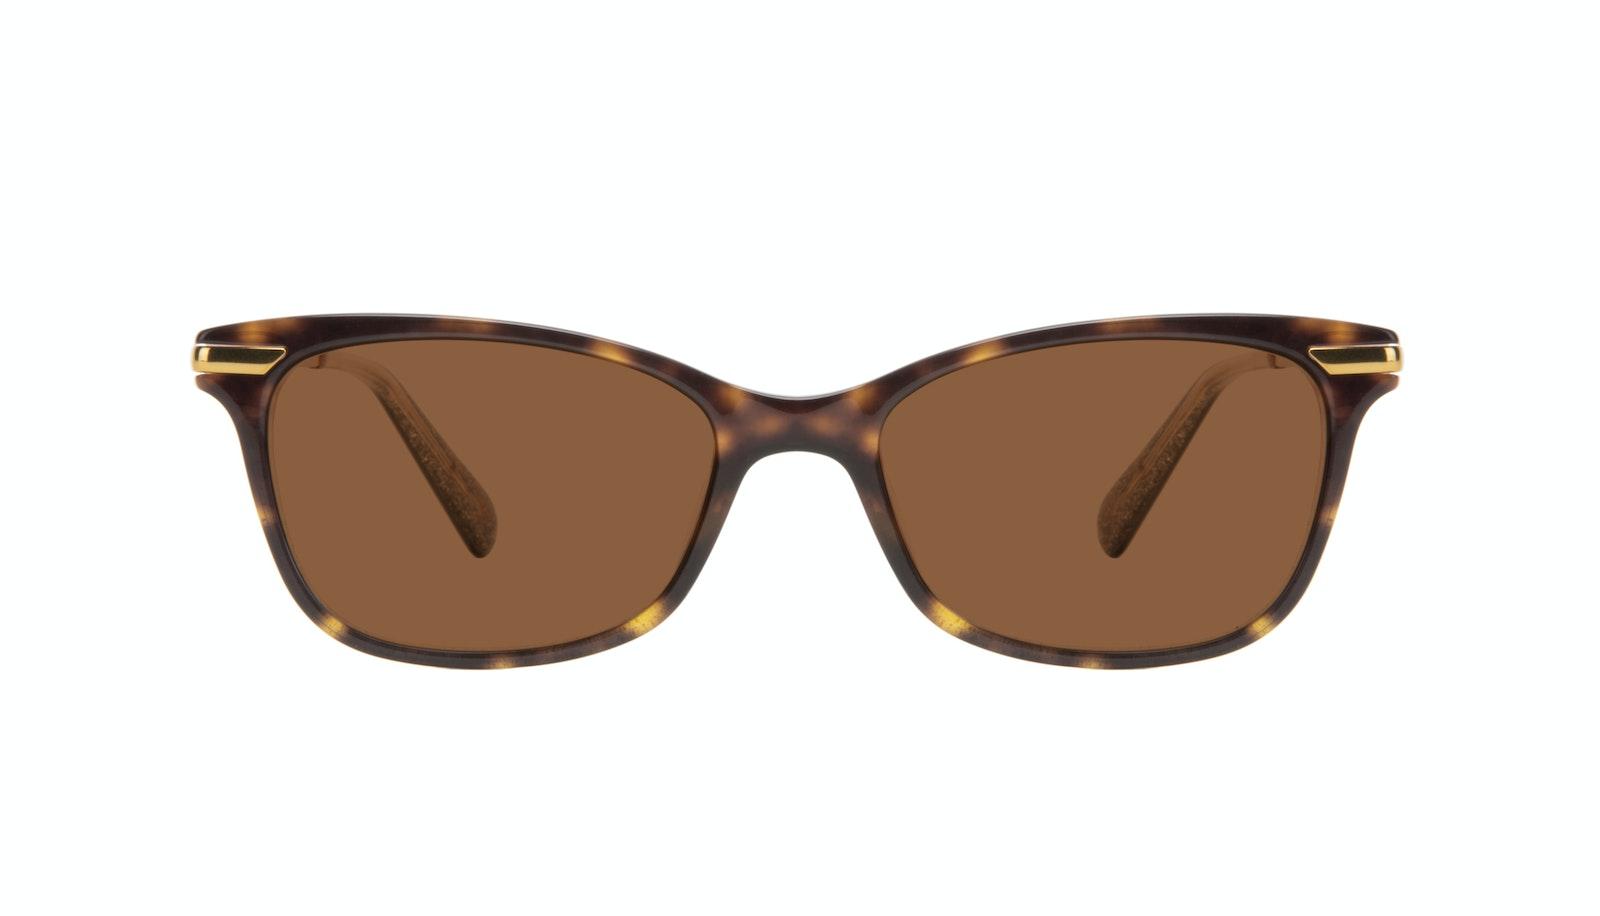 Affordable Fashion Glasses Rectangle Sunglasses Women Comet II Hazel Stardust